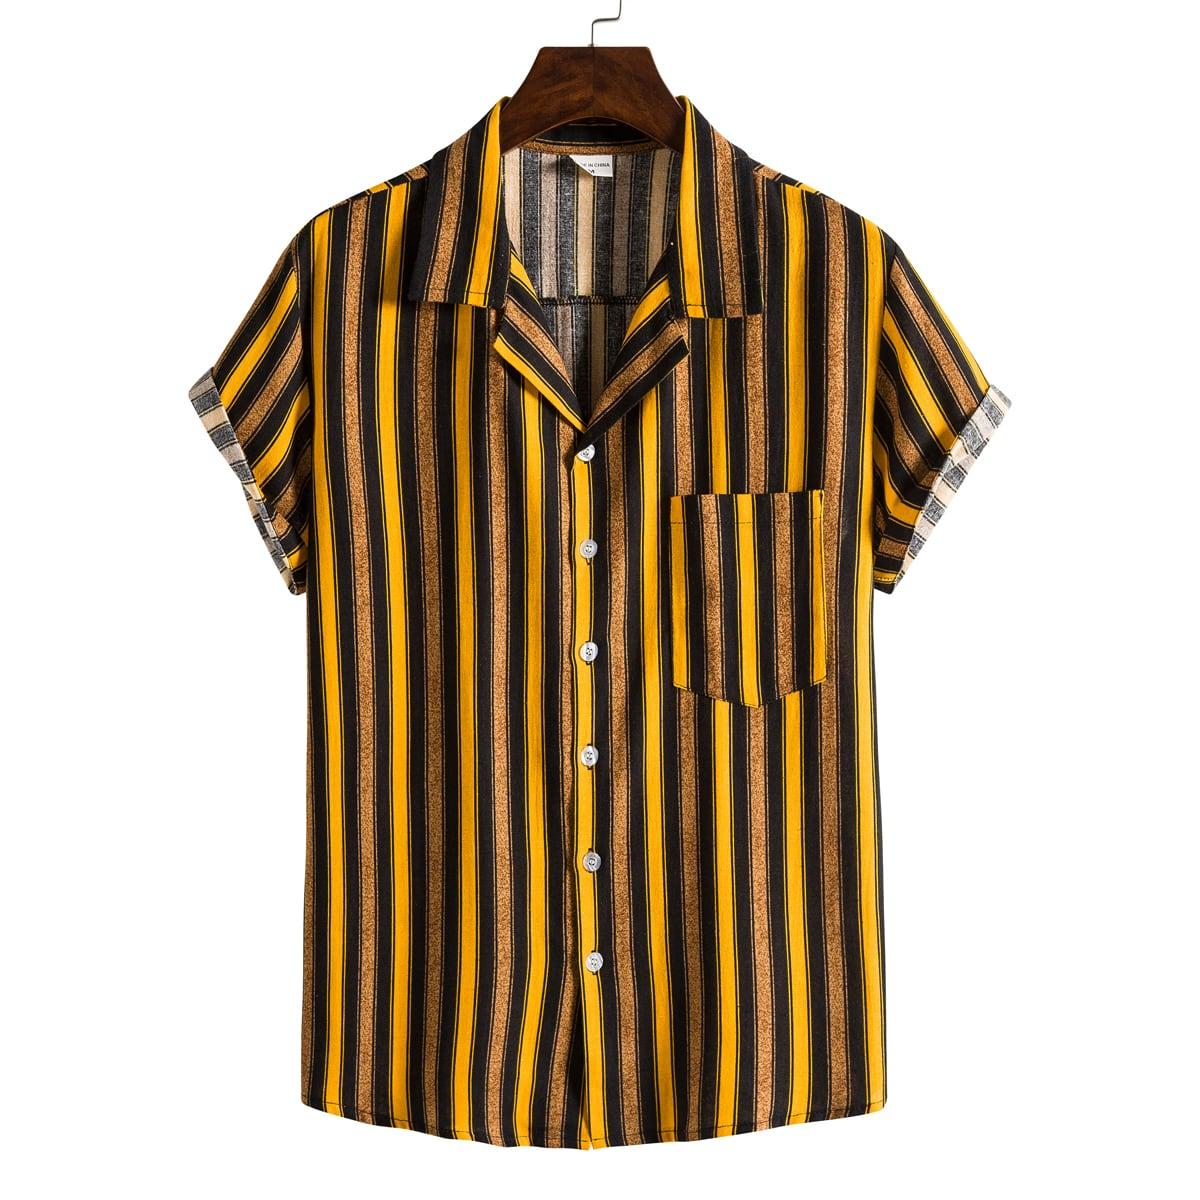 Guys Striped Shirt